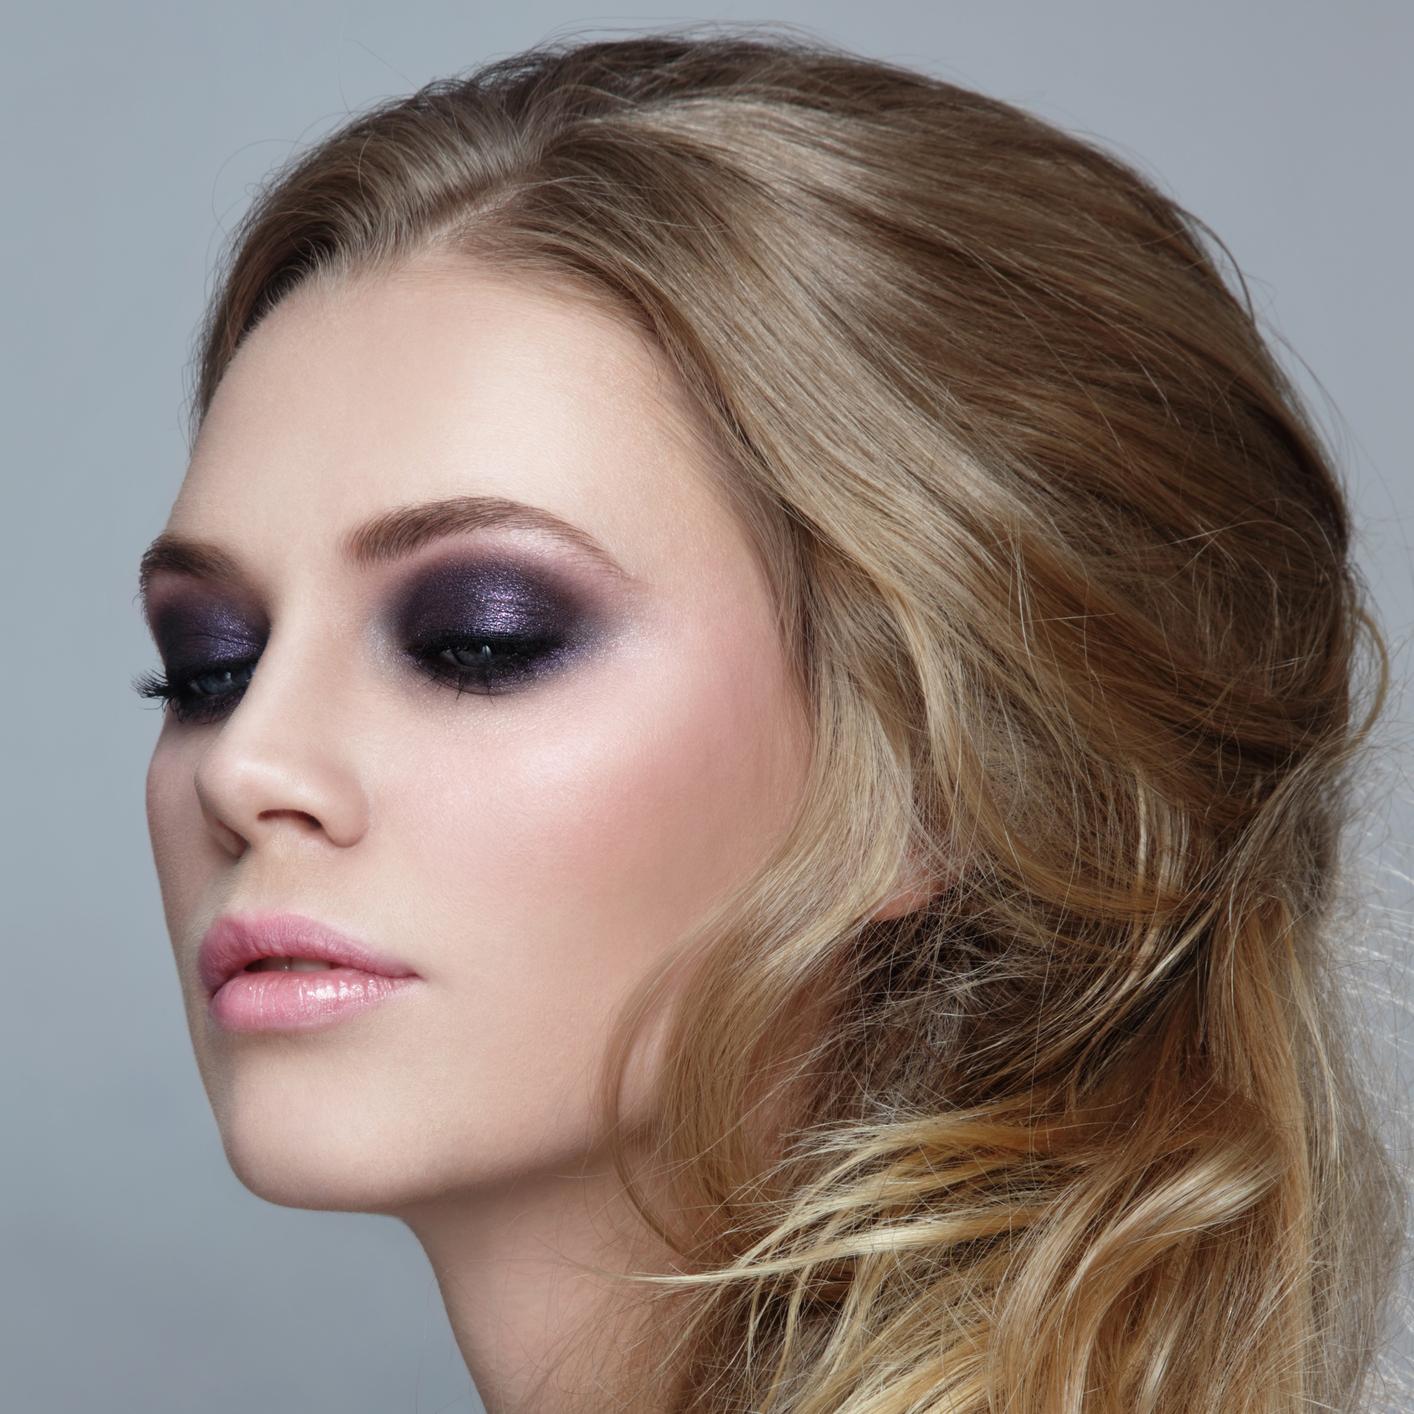 1_lipstick.jpg